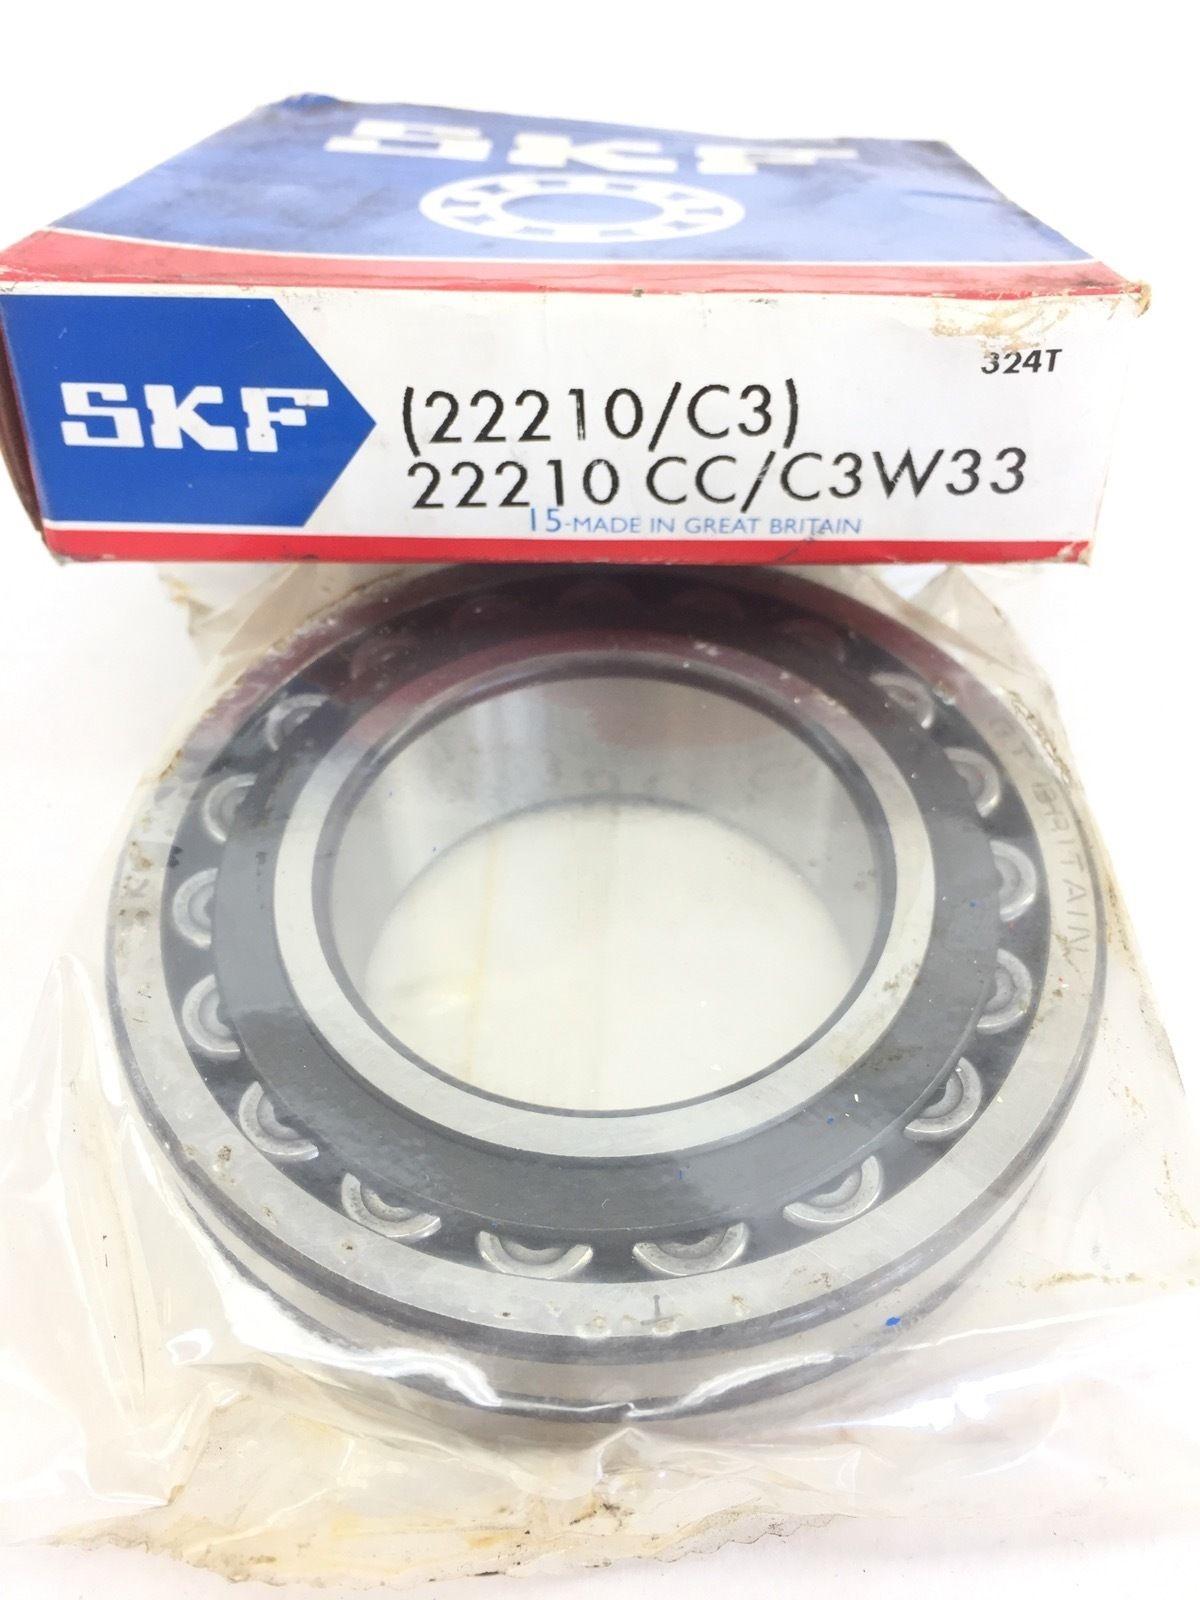 NIB SKF 22210 CC C3 W33 SPHERICAL ROLLER BEARING NEW IN BOX (A398) 2